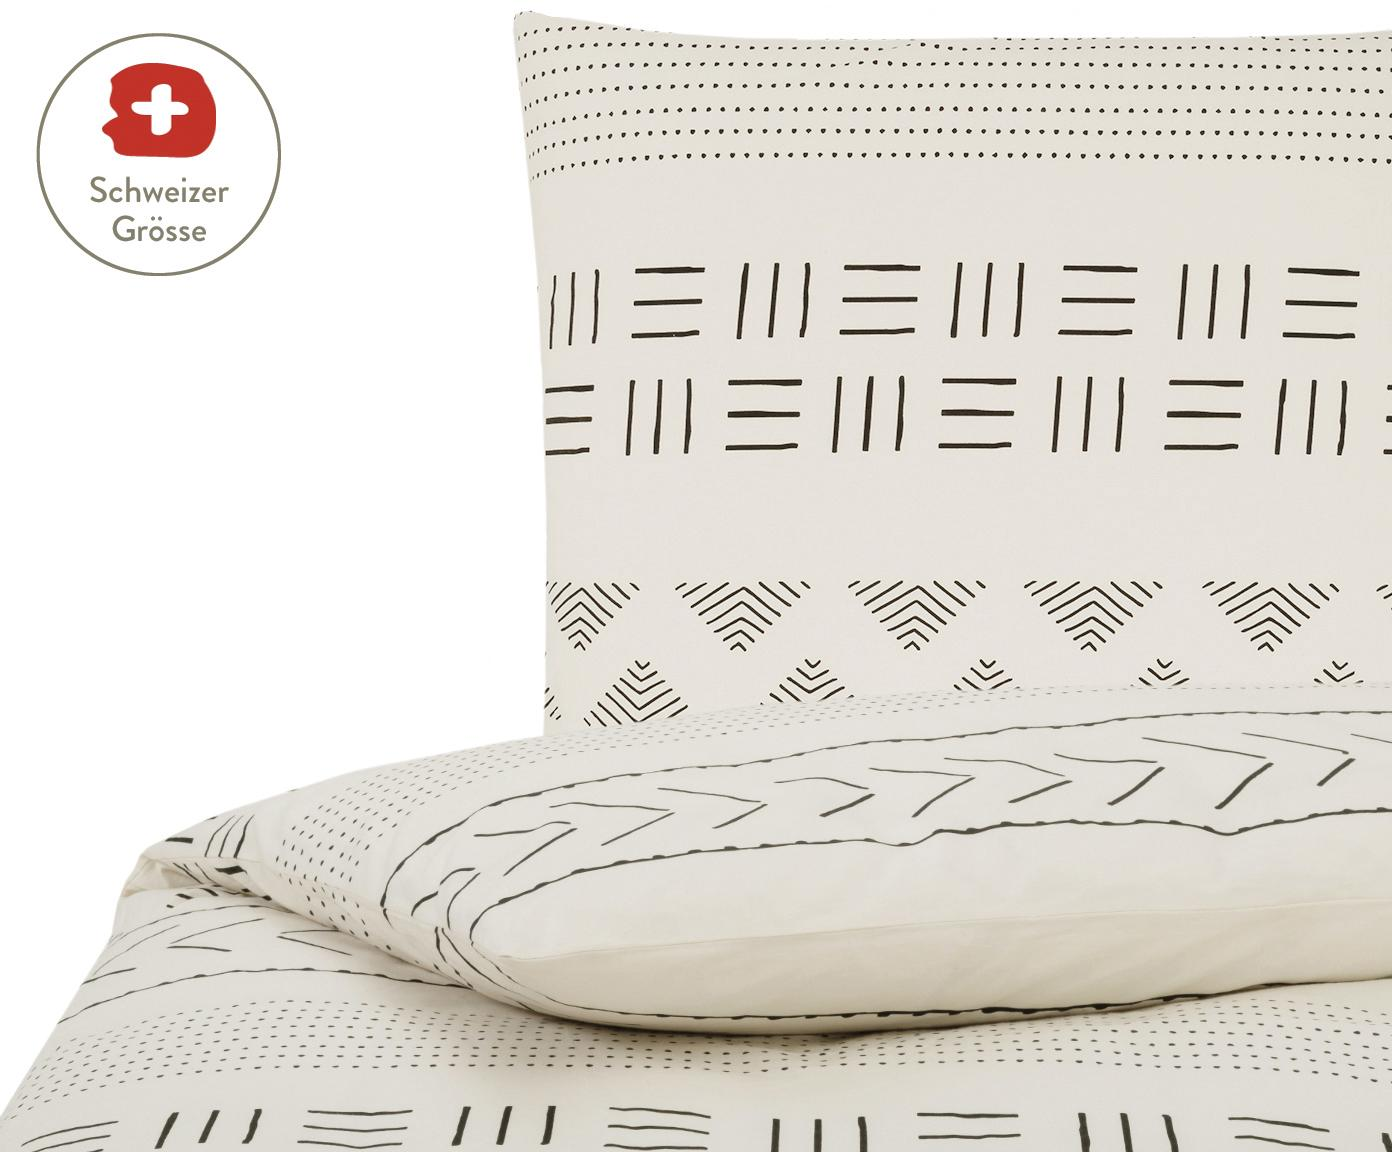 Gewaschener Baumwoll-Bettdeckenbezug Kohana im Boho Style, Webart: Perkal Fadendichte 180 TC, Ecru, Schwarz, 160 x 210 cm